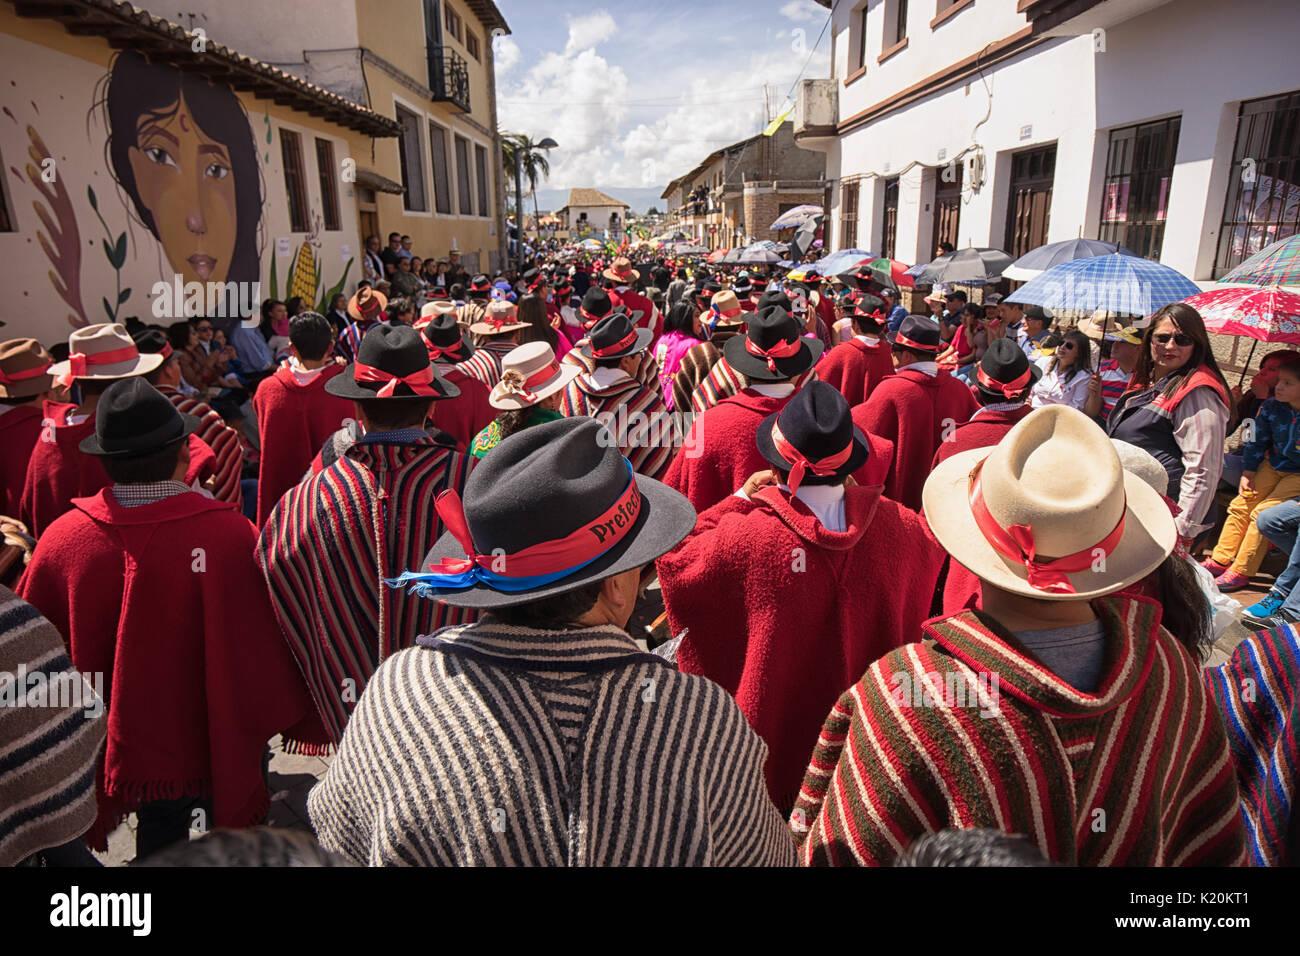 June 17, 2017 Pujili, Ecuador: the annual Corpus Christi parade is consideted a national heritage treasure - Stock Image